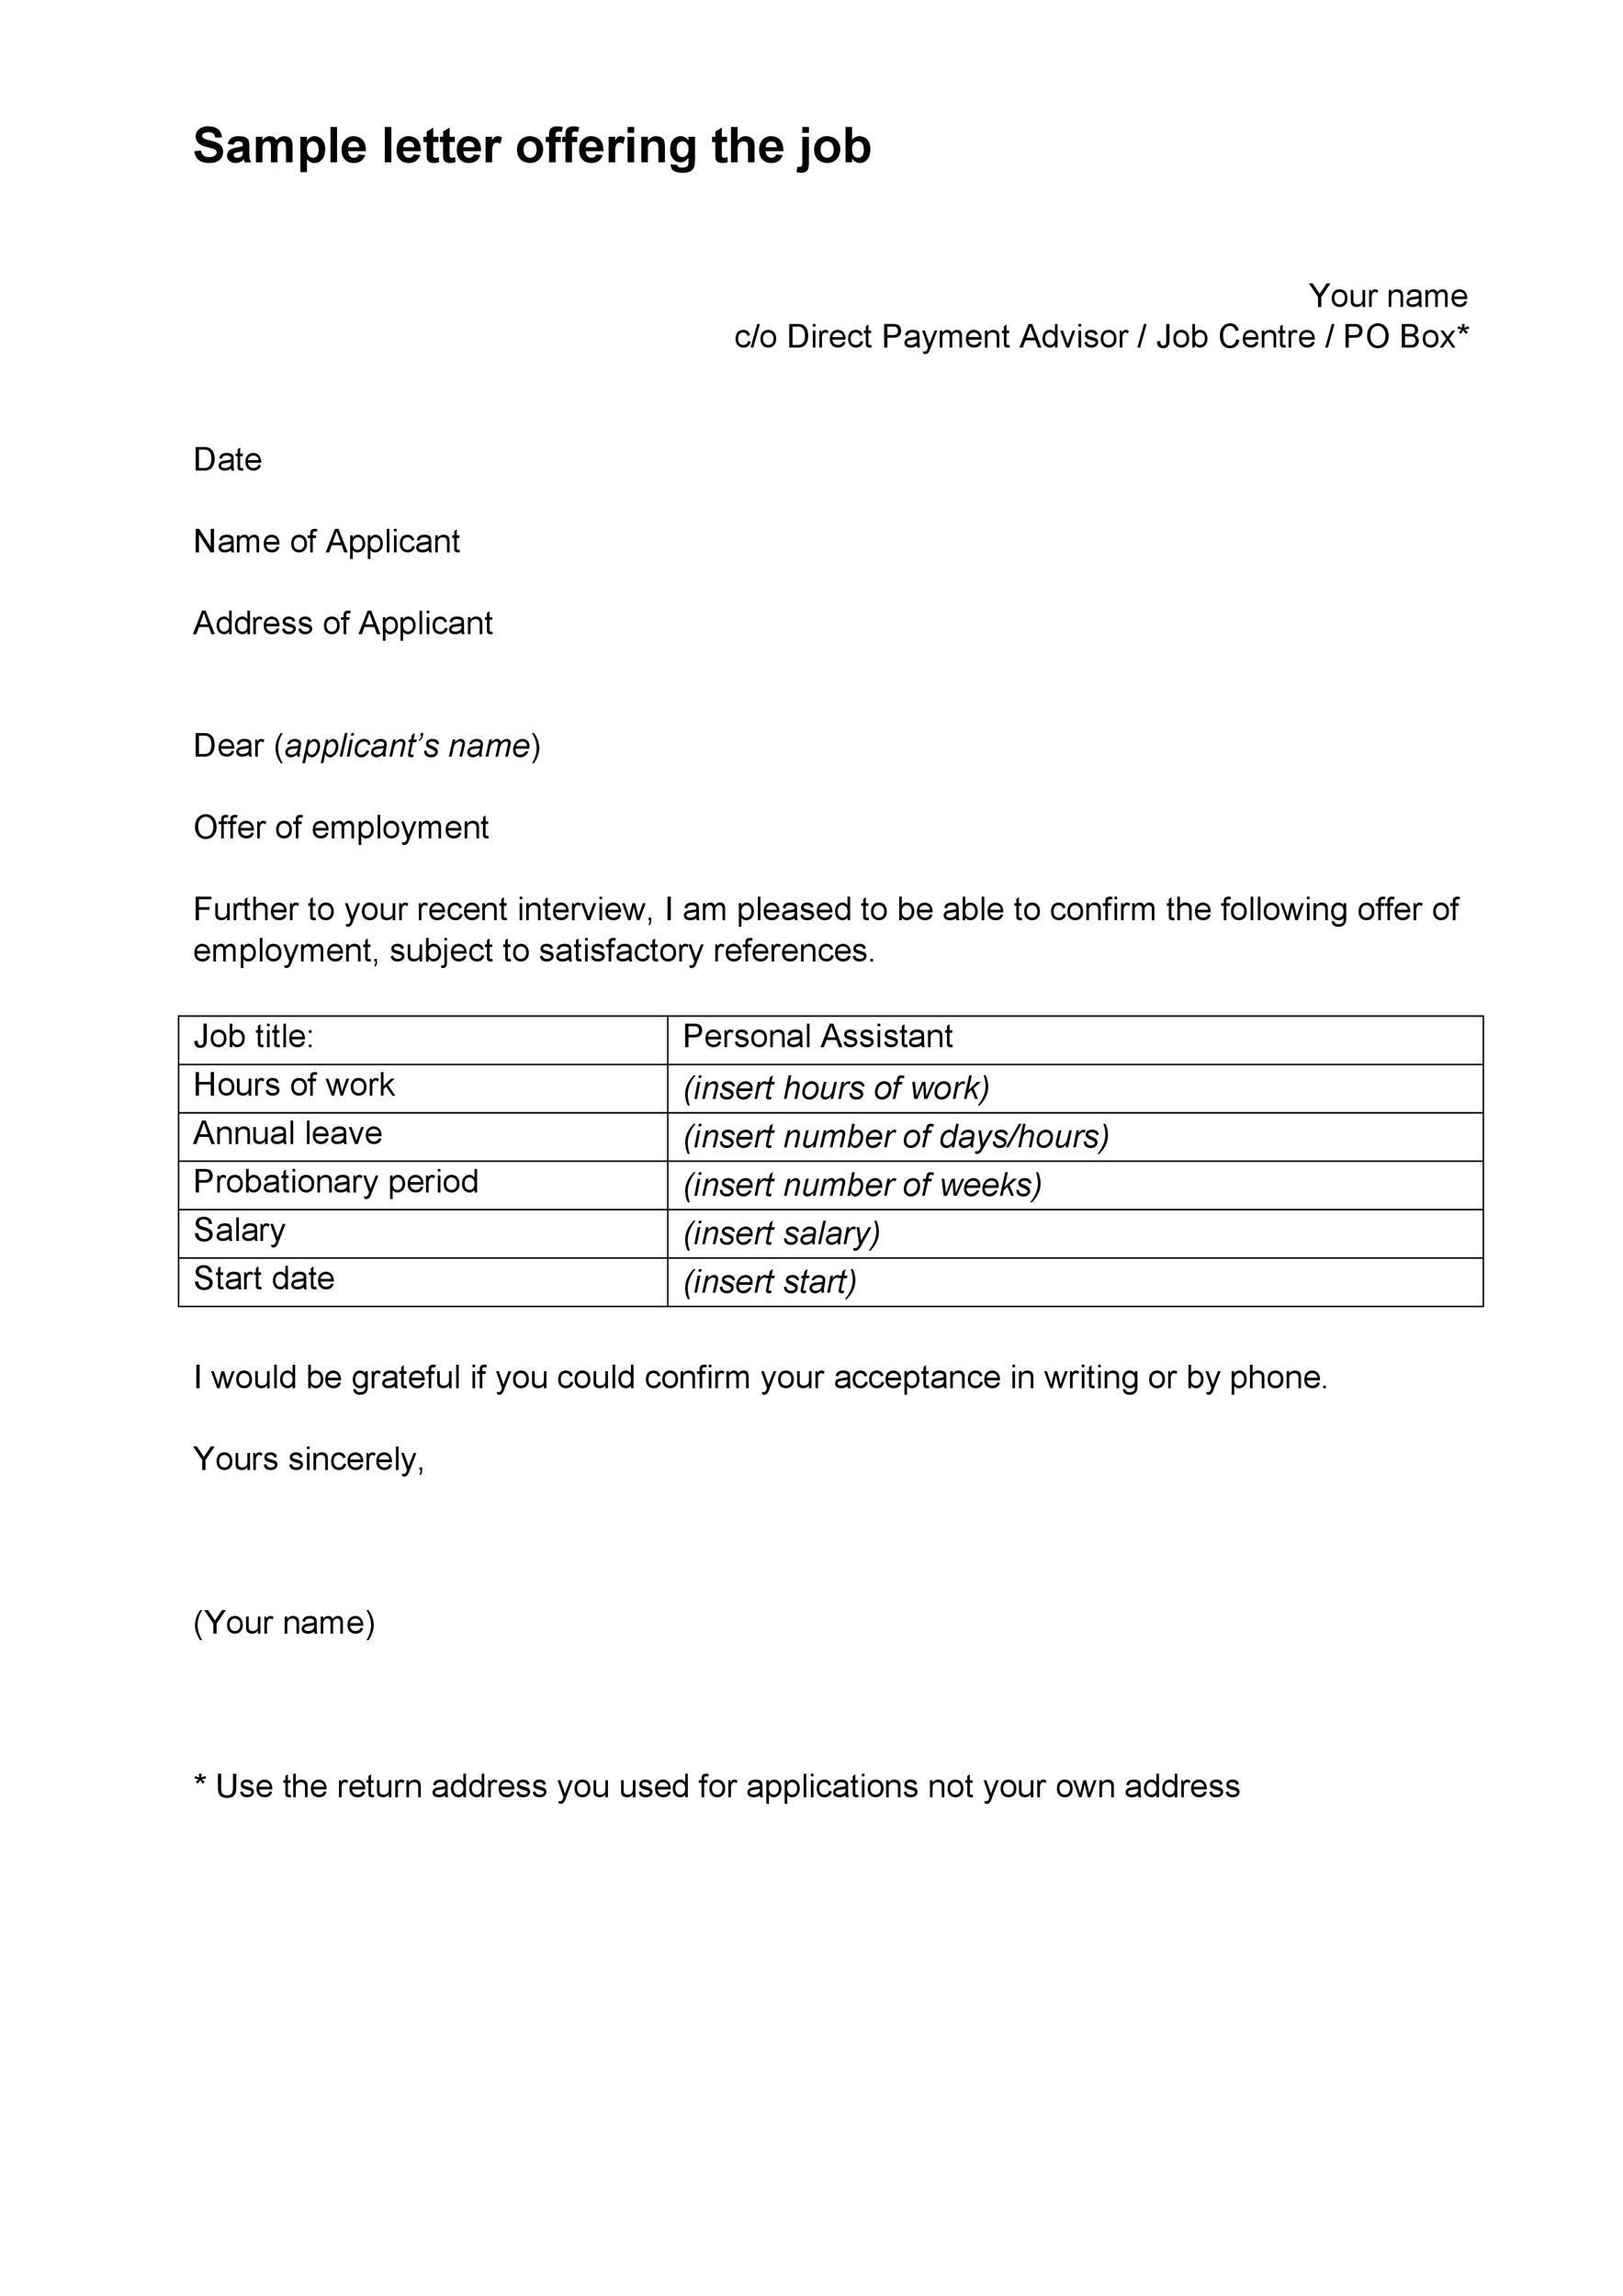 Free Offer letter 37